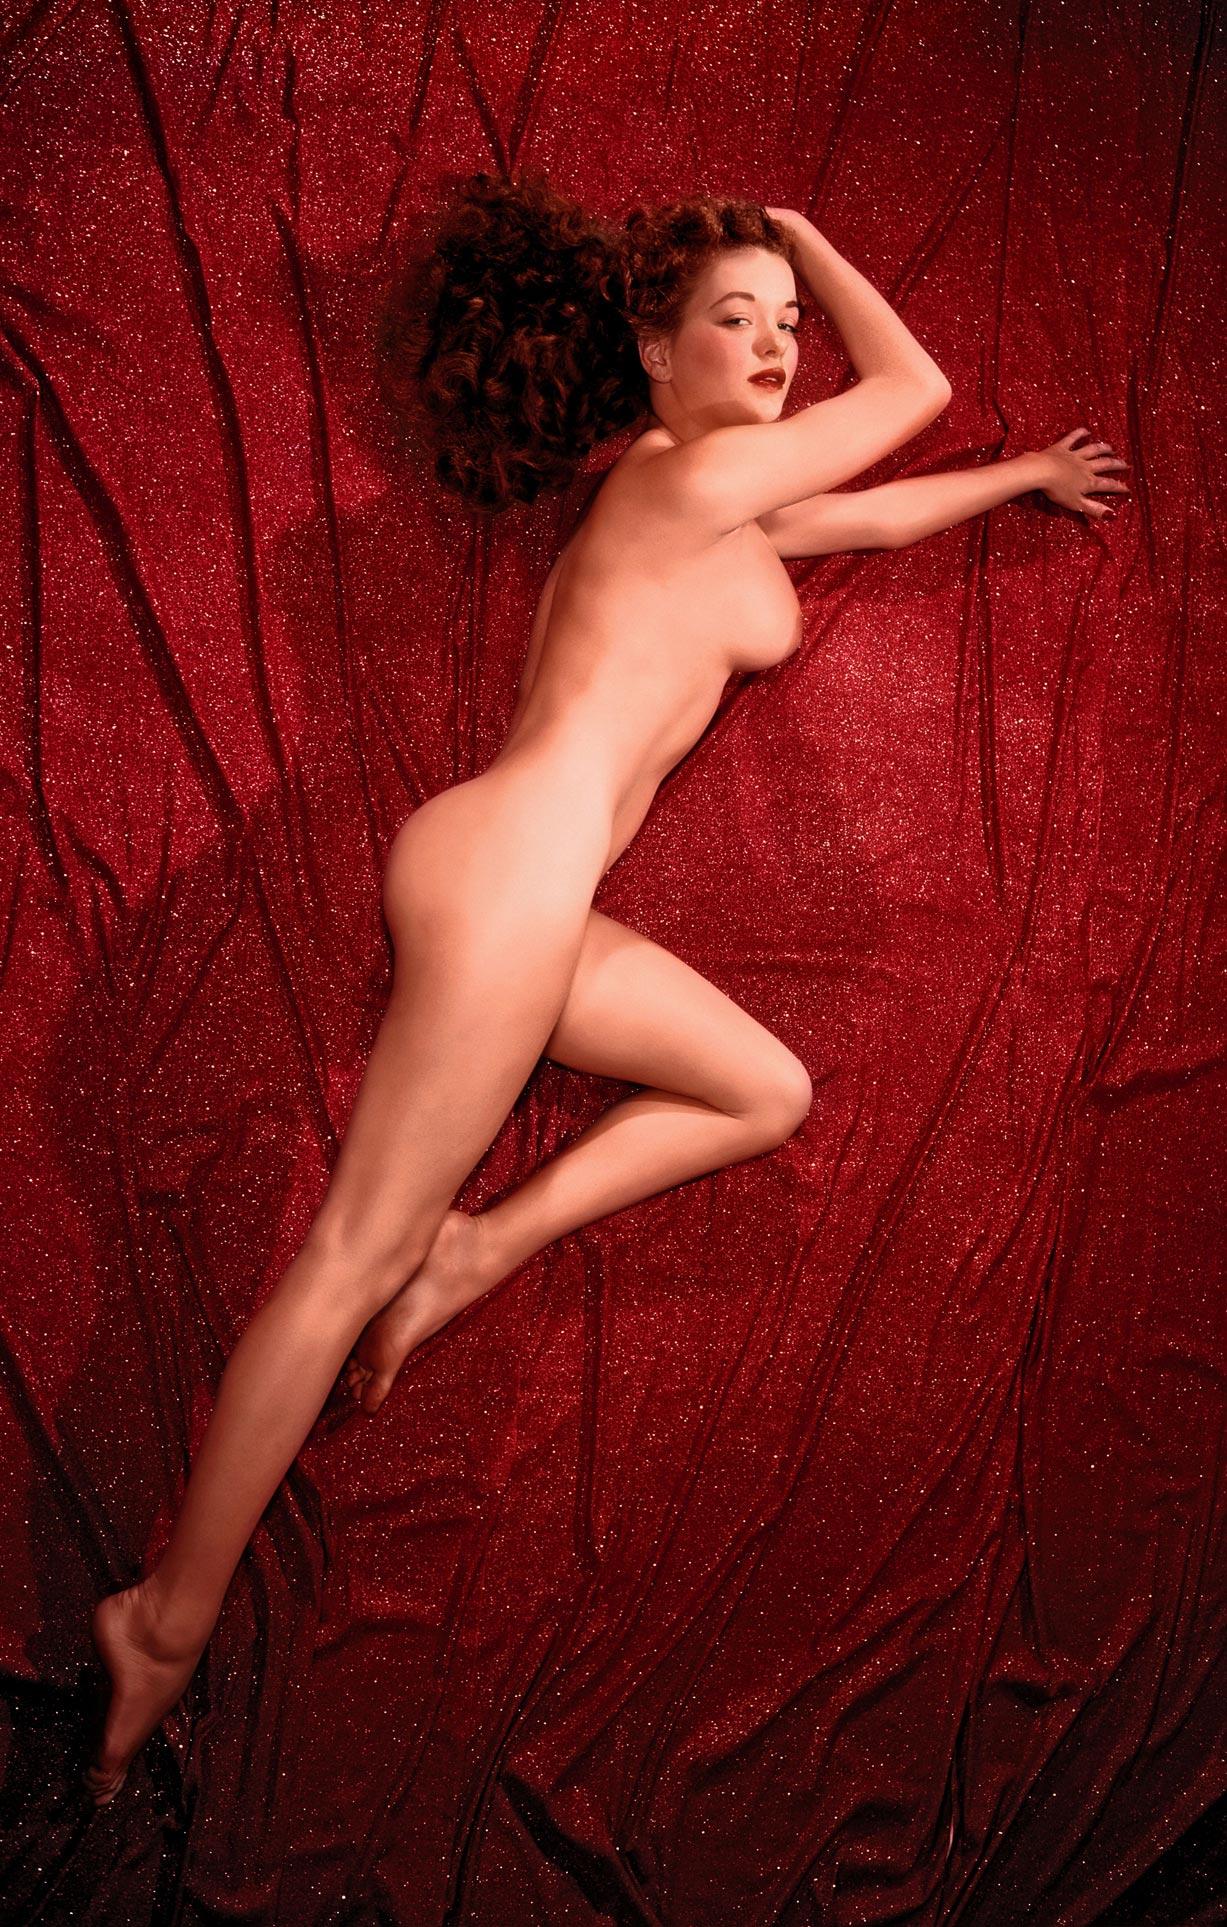 Playboy Playmate - Miss August 1954 | Arline Hunter / Эрлин Хантер